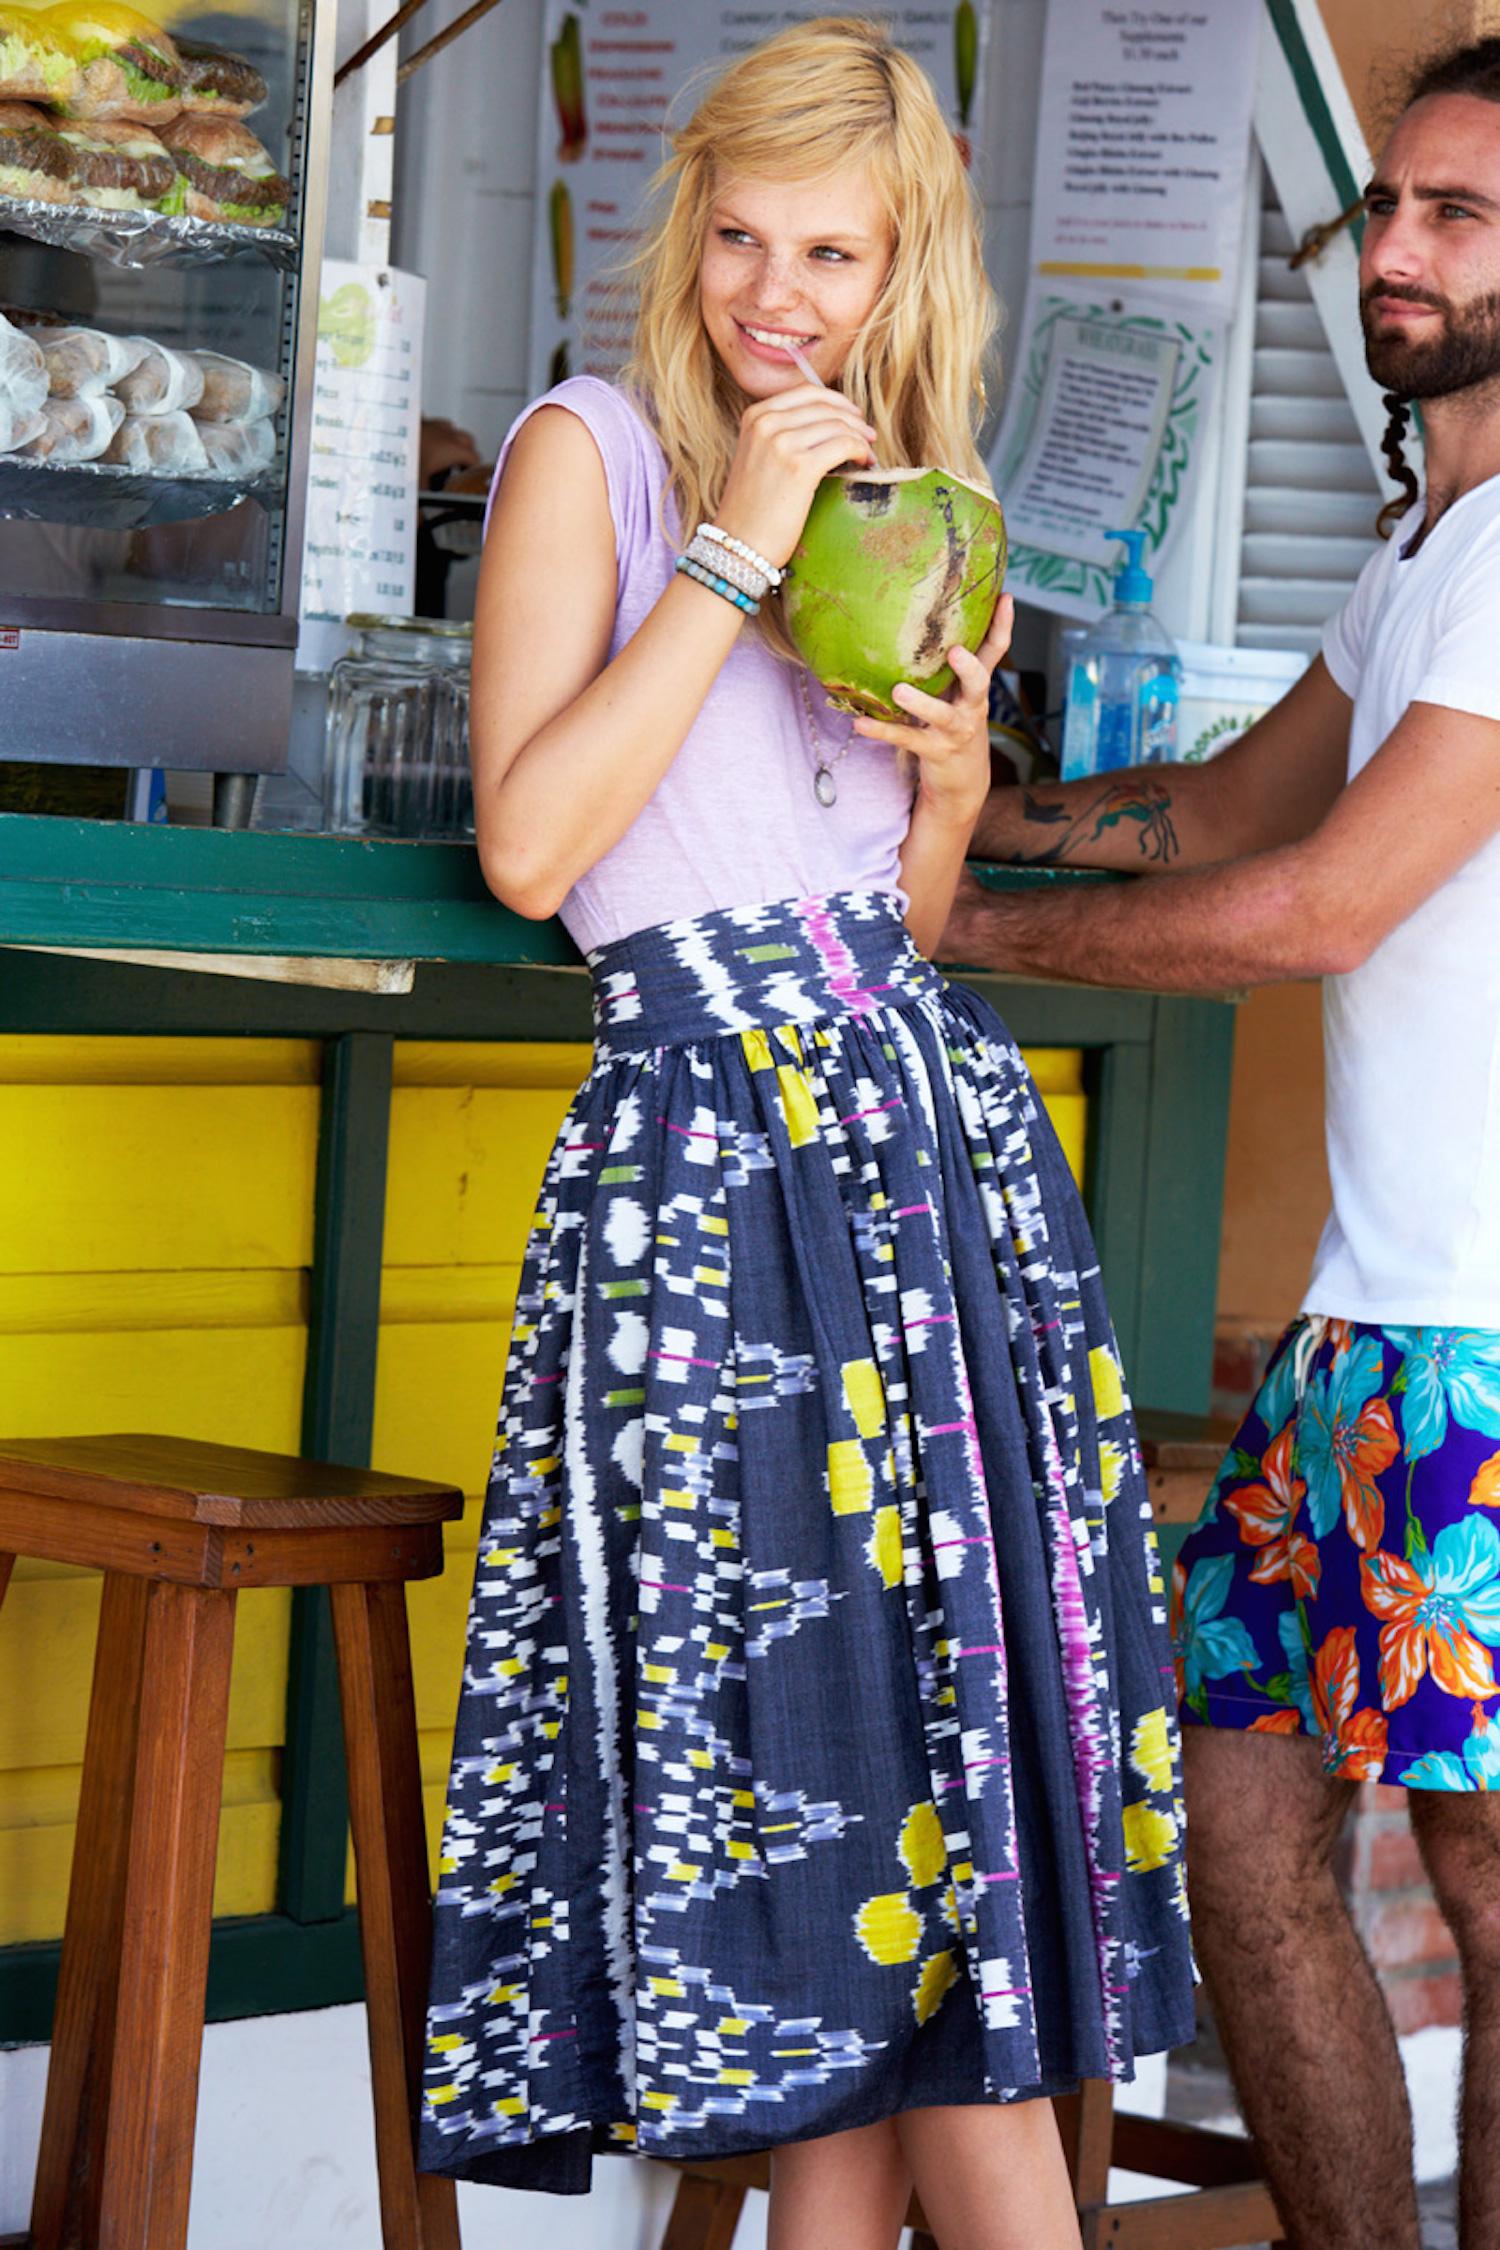 coconut water calypso st barth in barbados with nadine leopold and matt jones